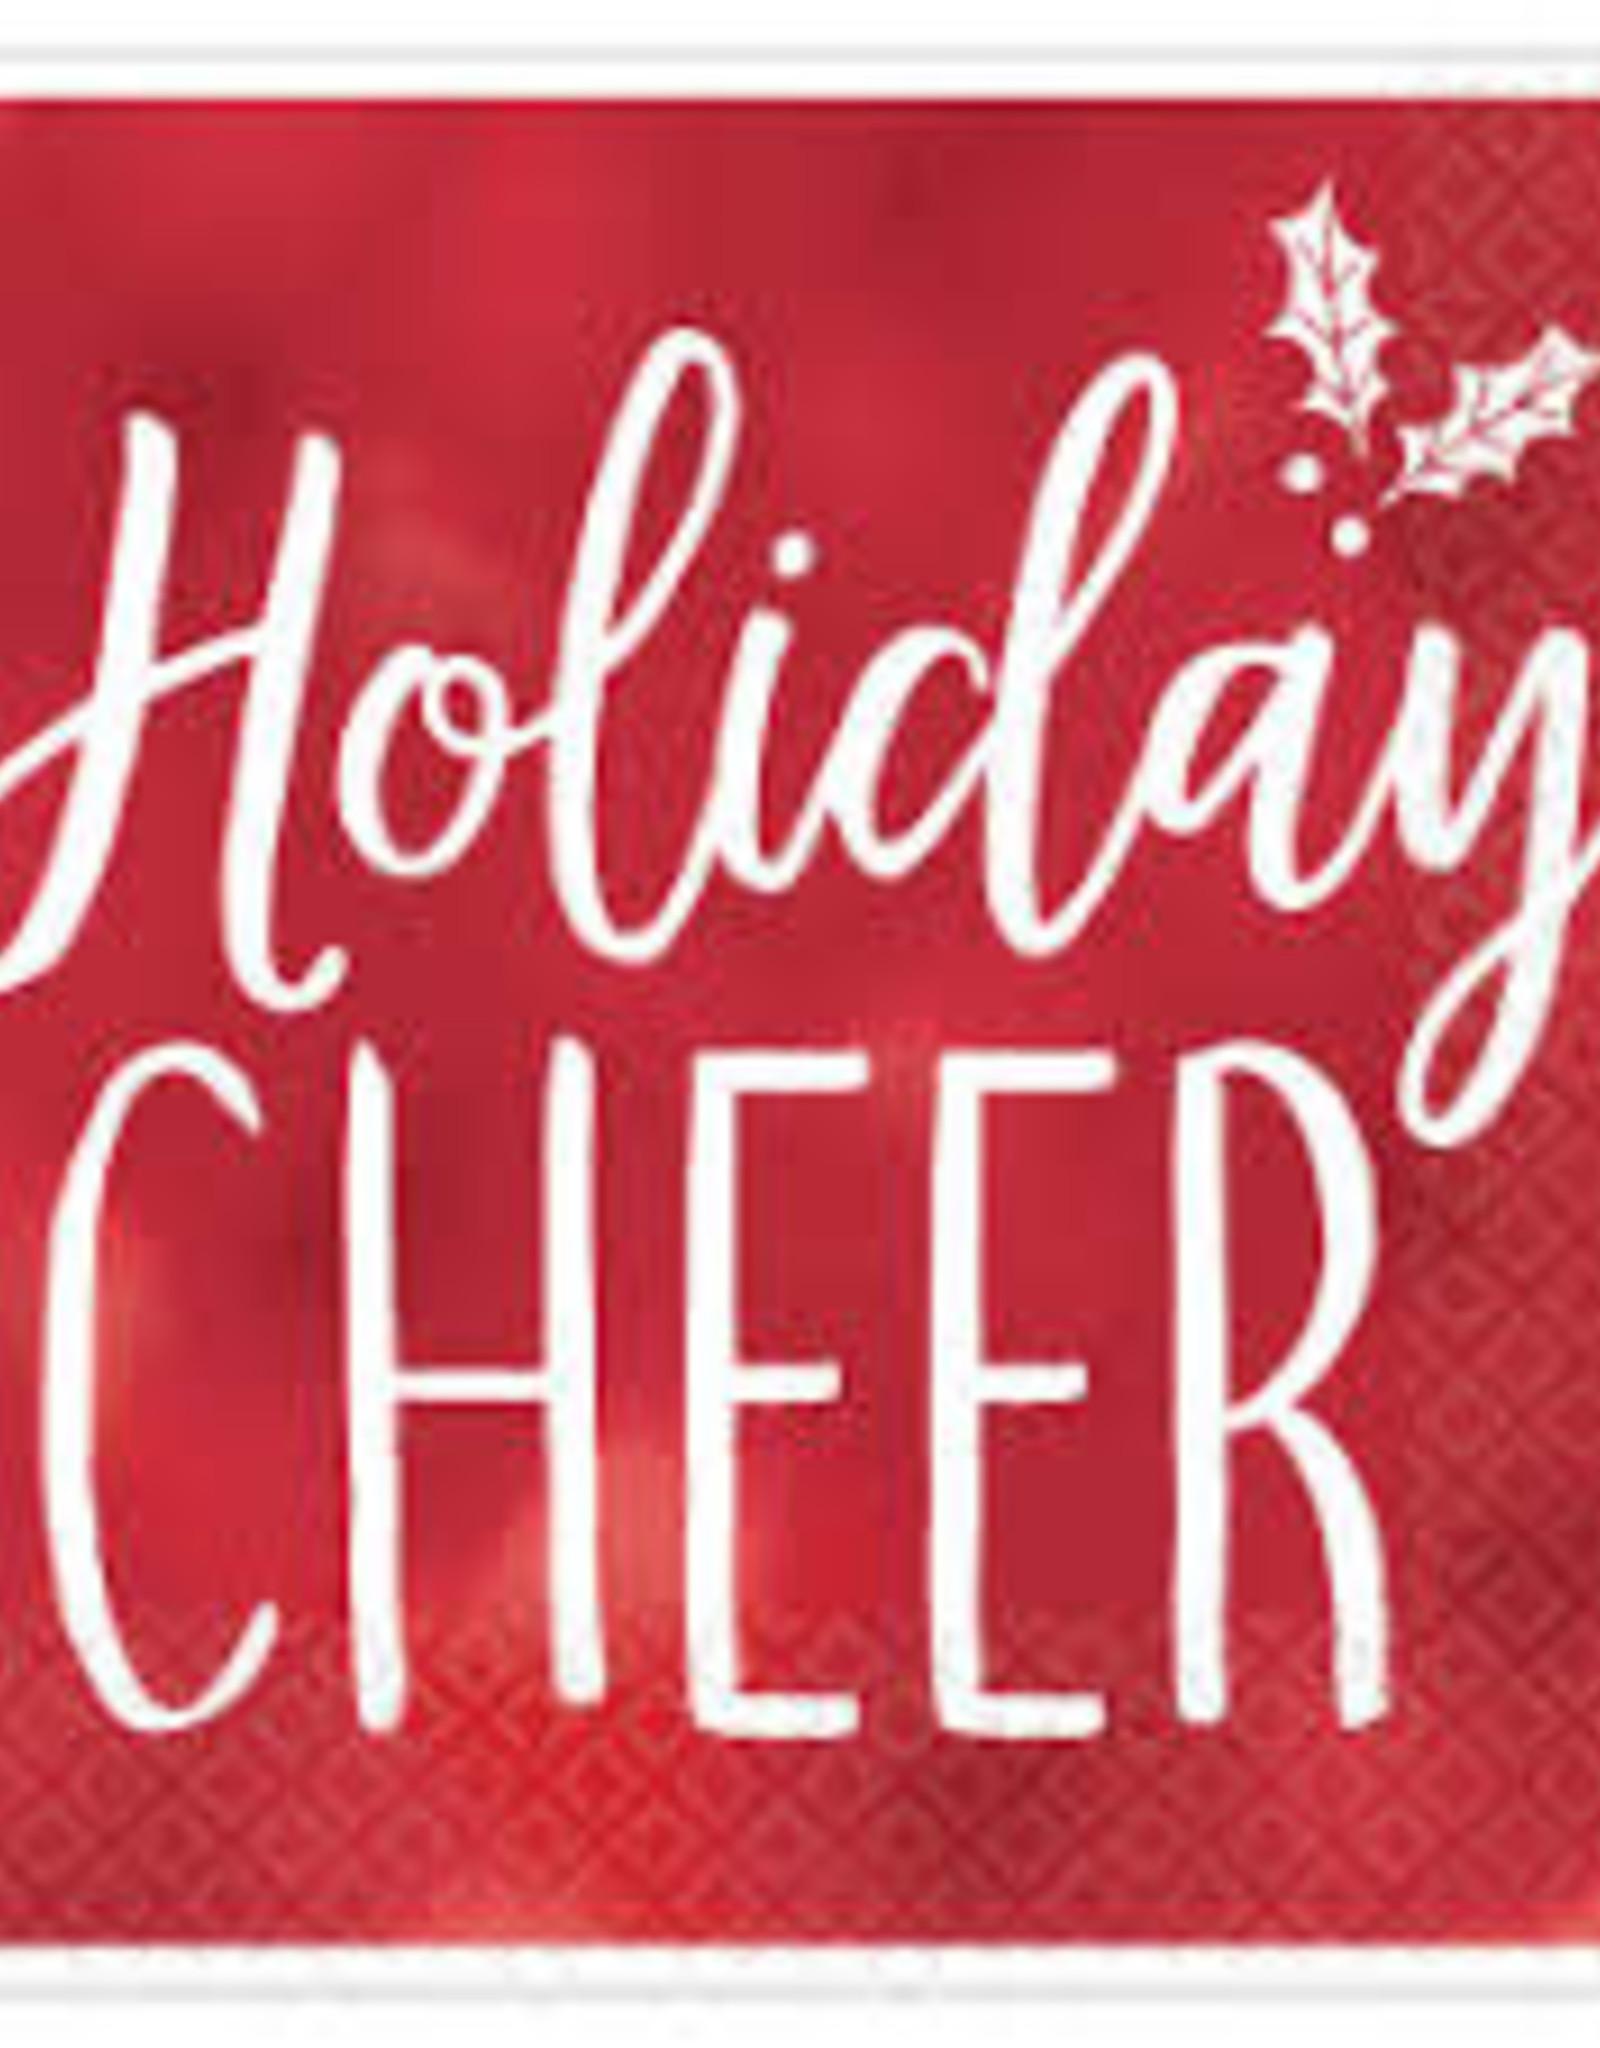 Holiday Cheer Holiday napkin